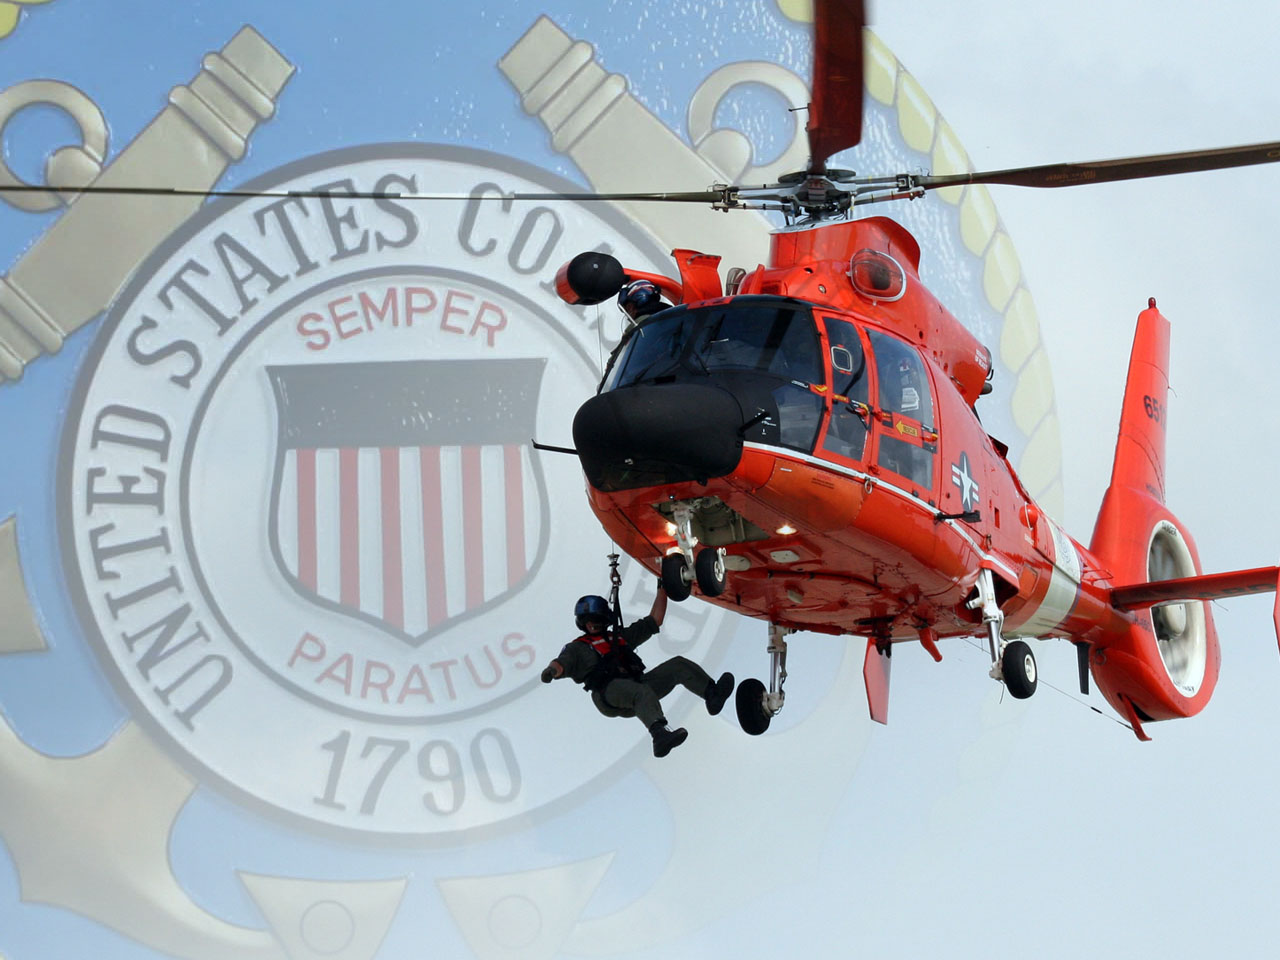 Free Download Coast Guard Wallpaper 1280x960 For Your Desktop